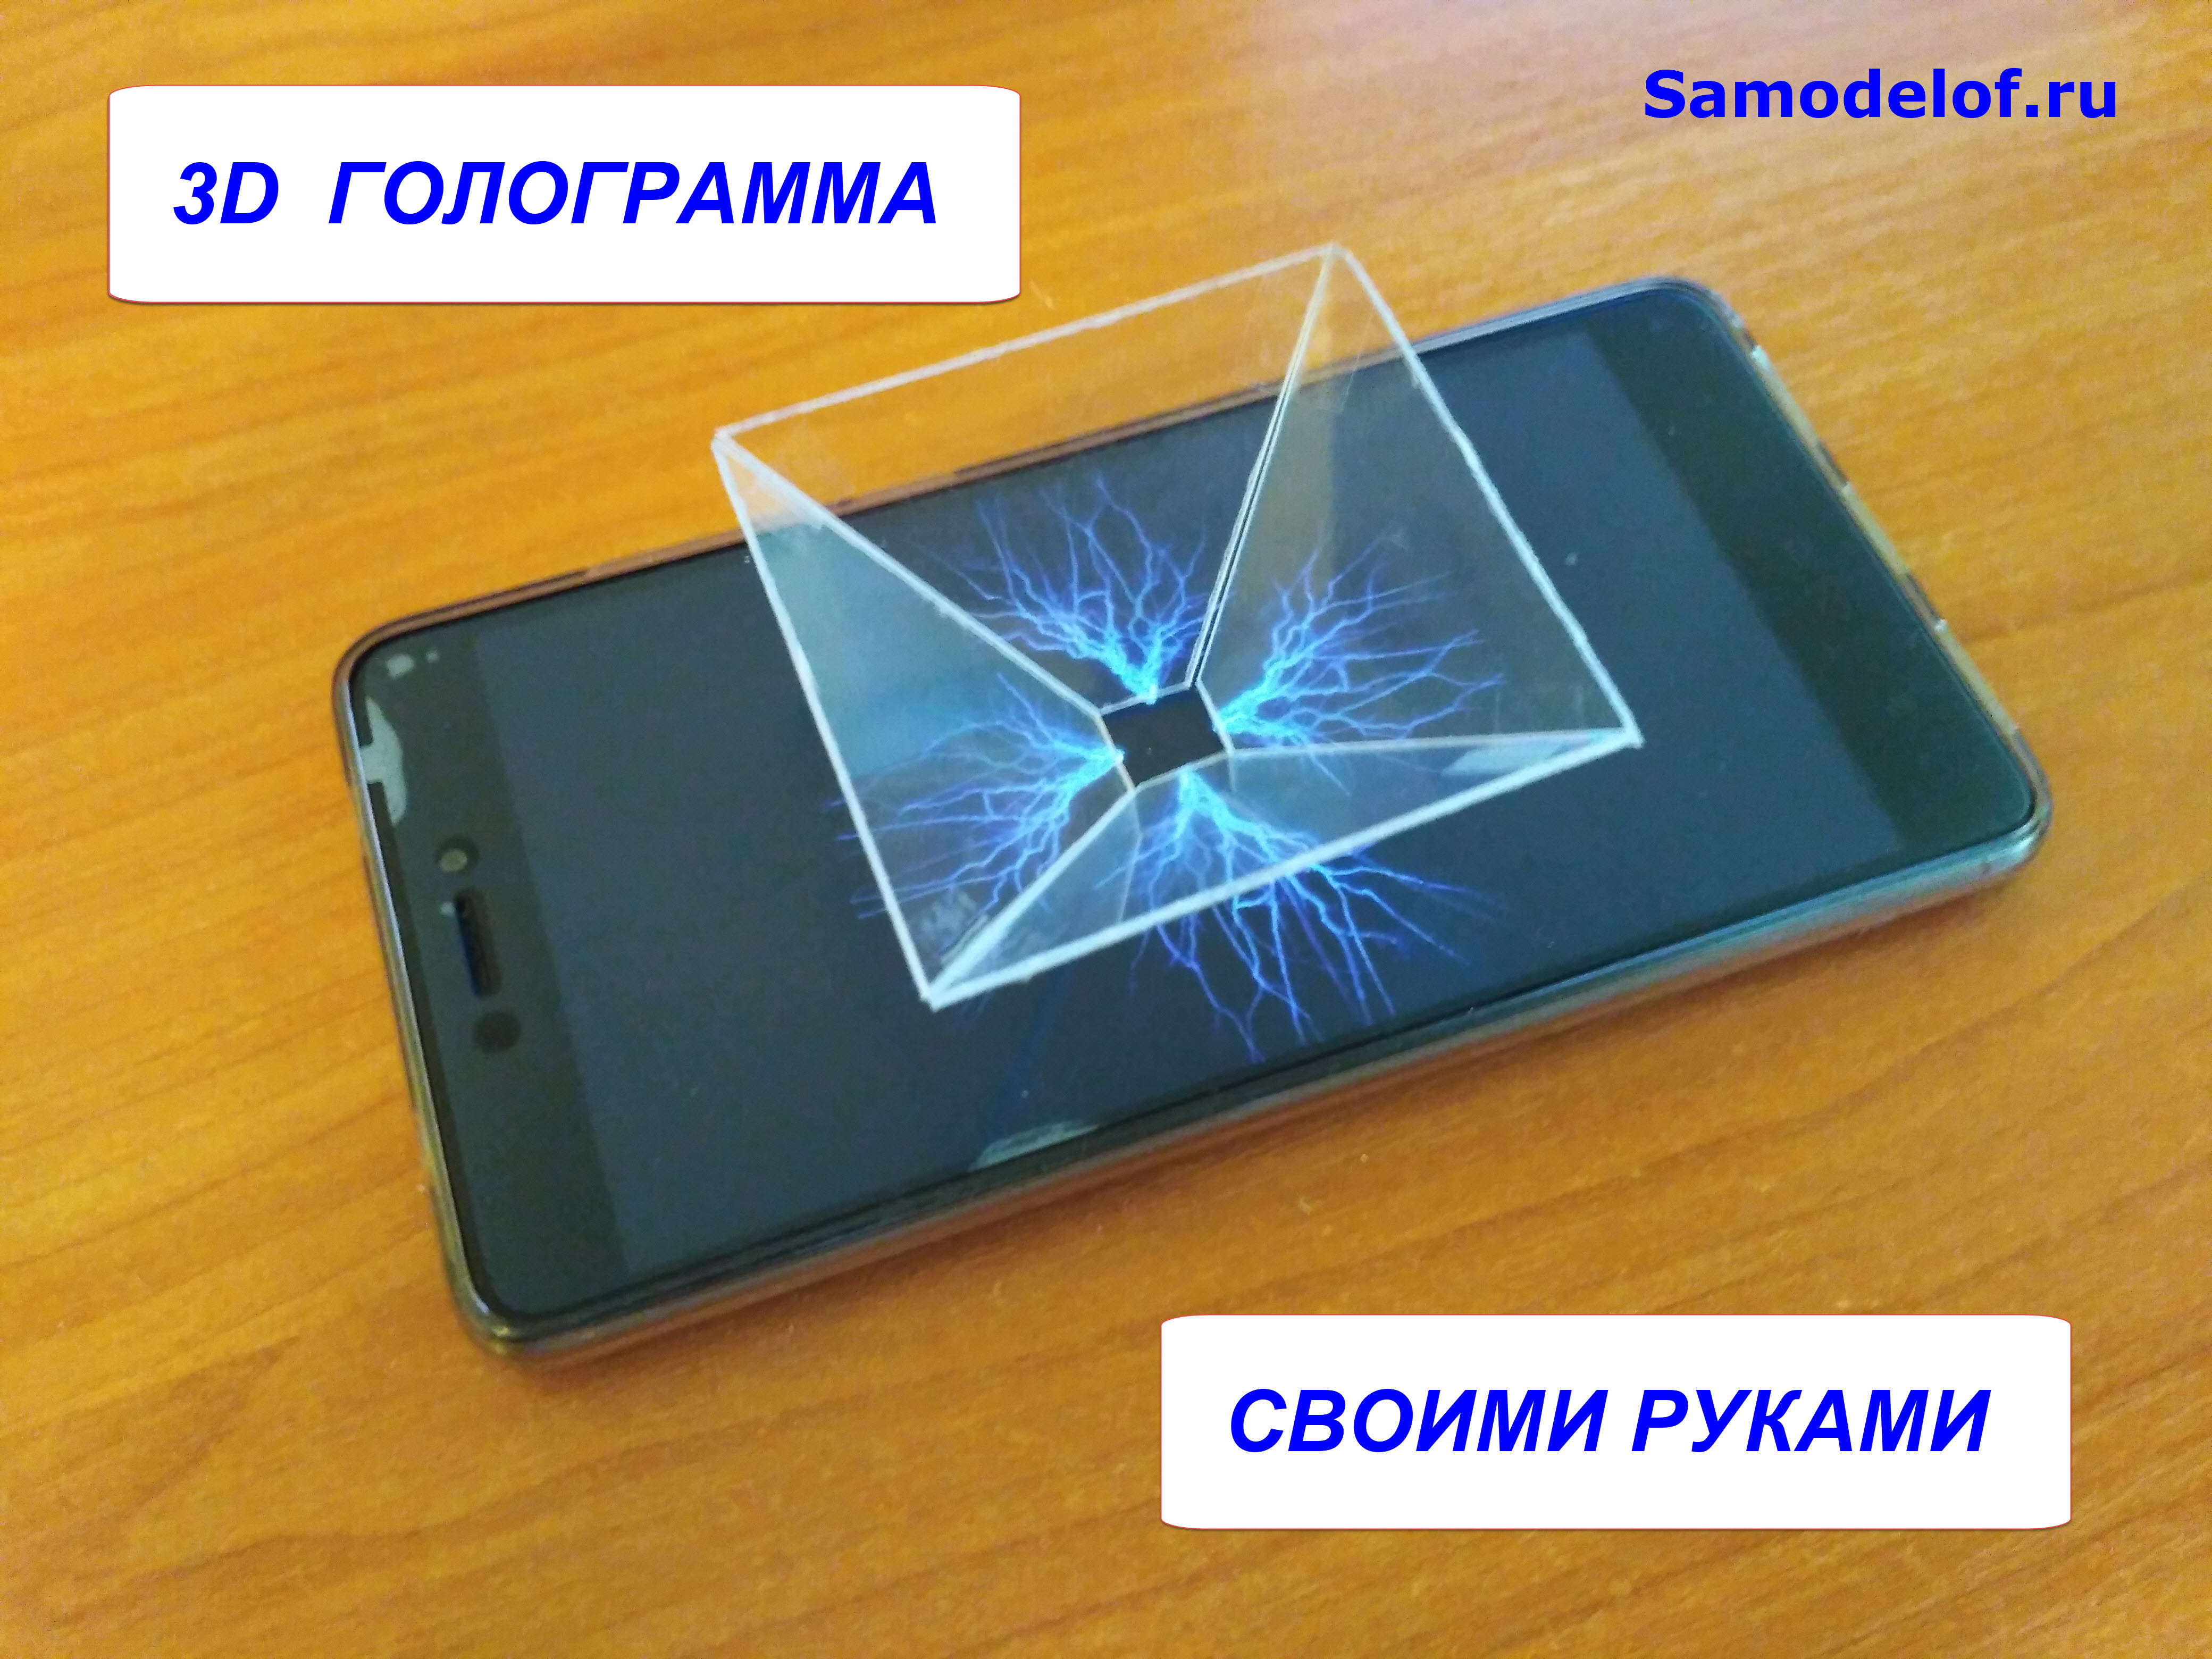 3D голограмма на телефоне